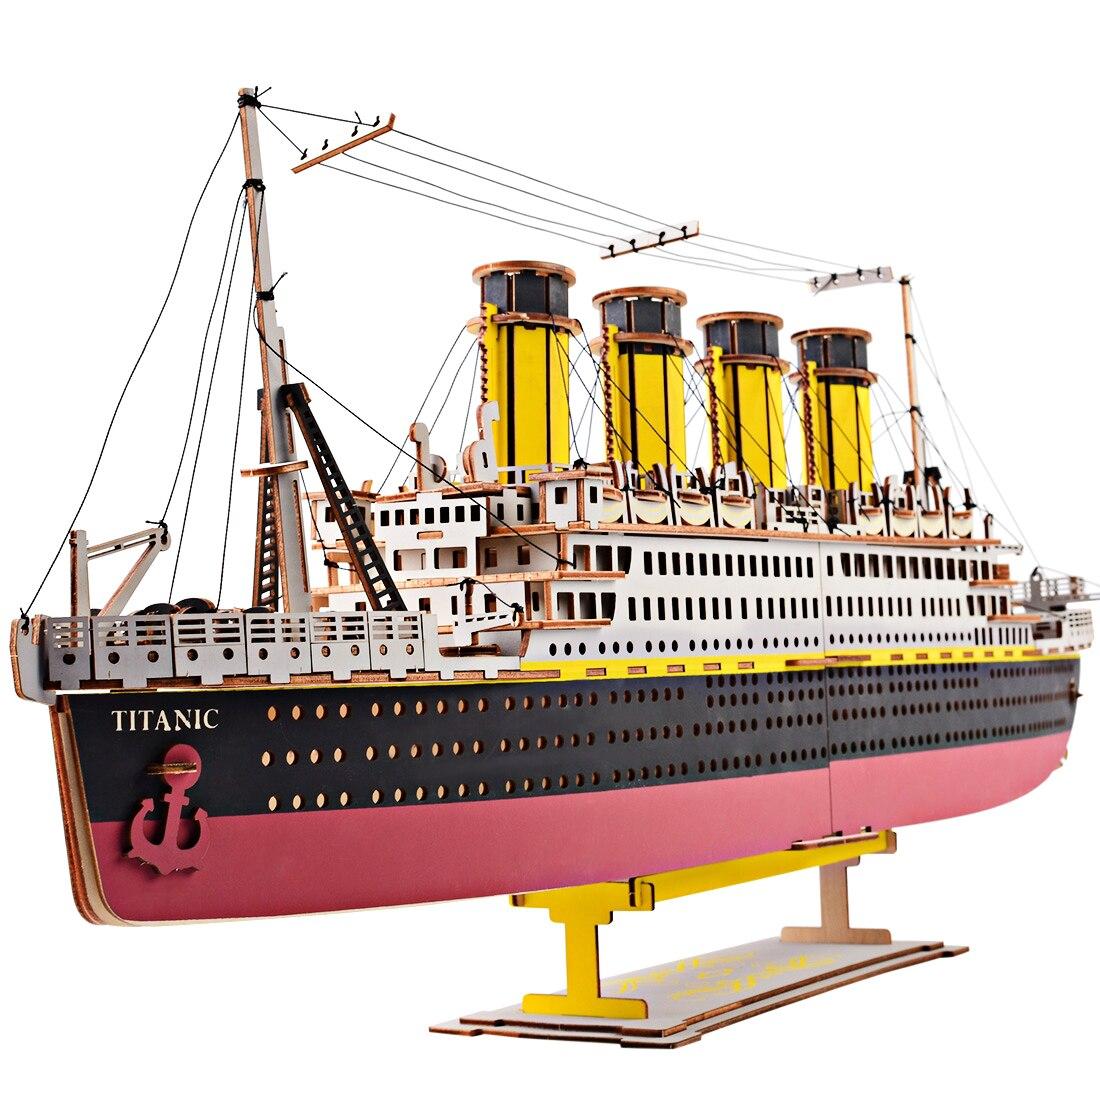 High Precision Laser Cutting Puzzle 3D Wooden Jigsaw Model Children Intelligence Developmental Toys Model Building Kit Titanic